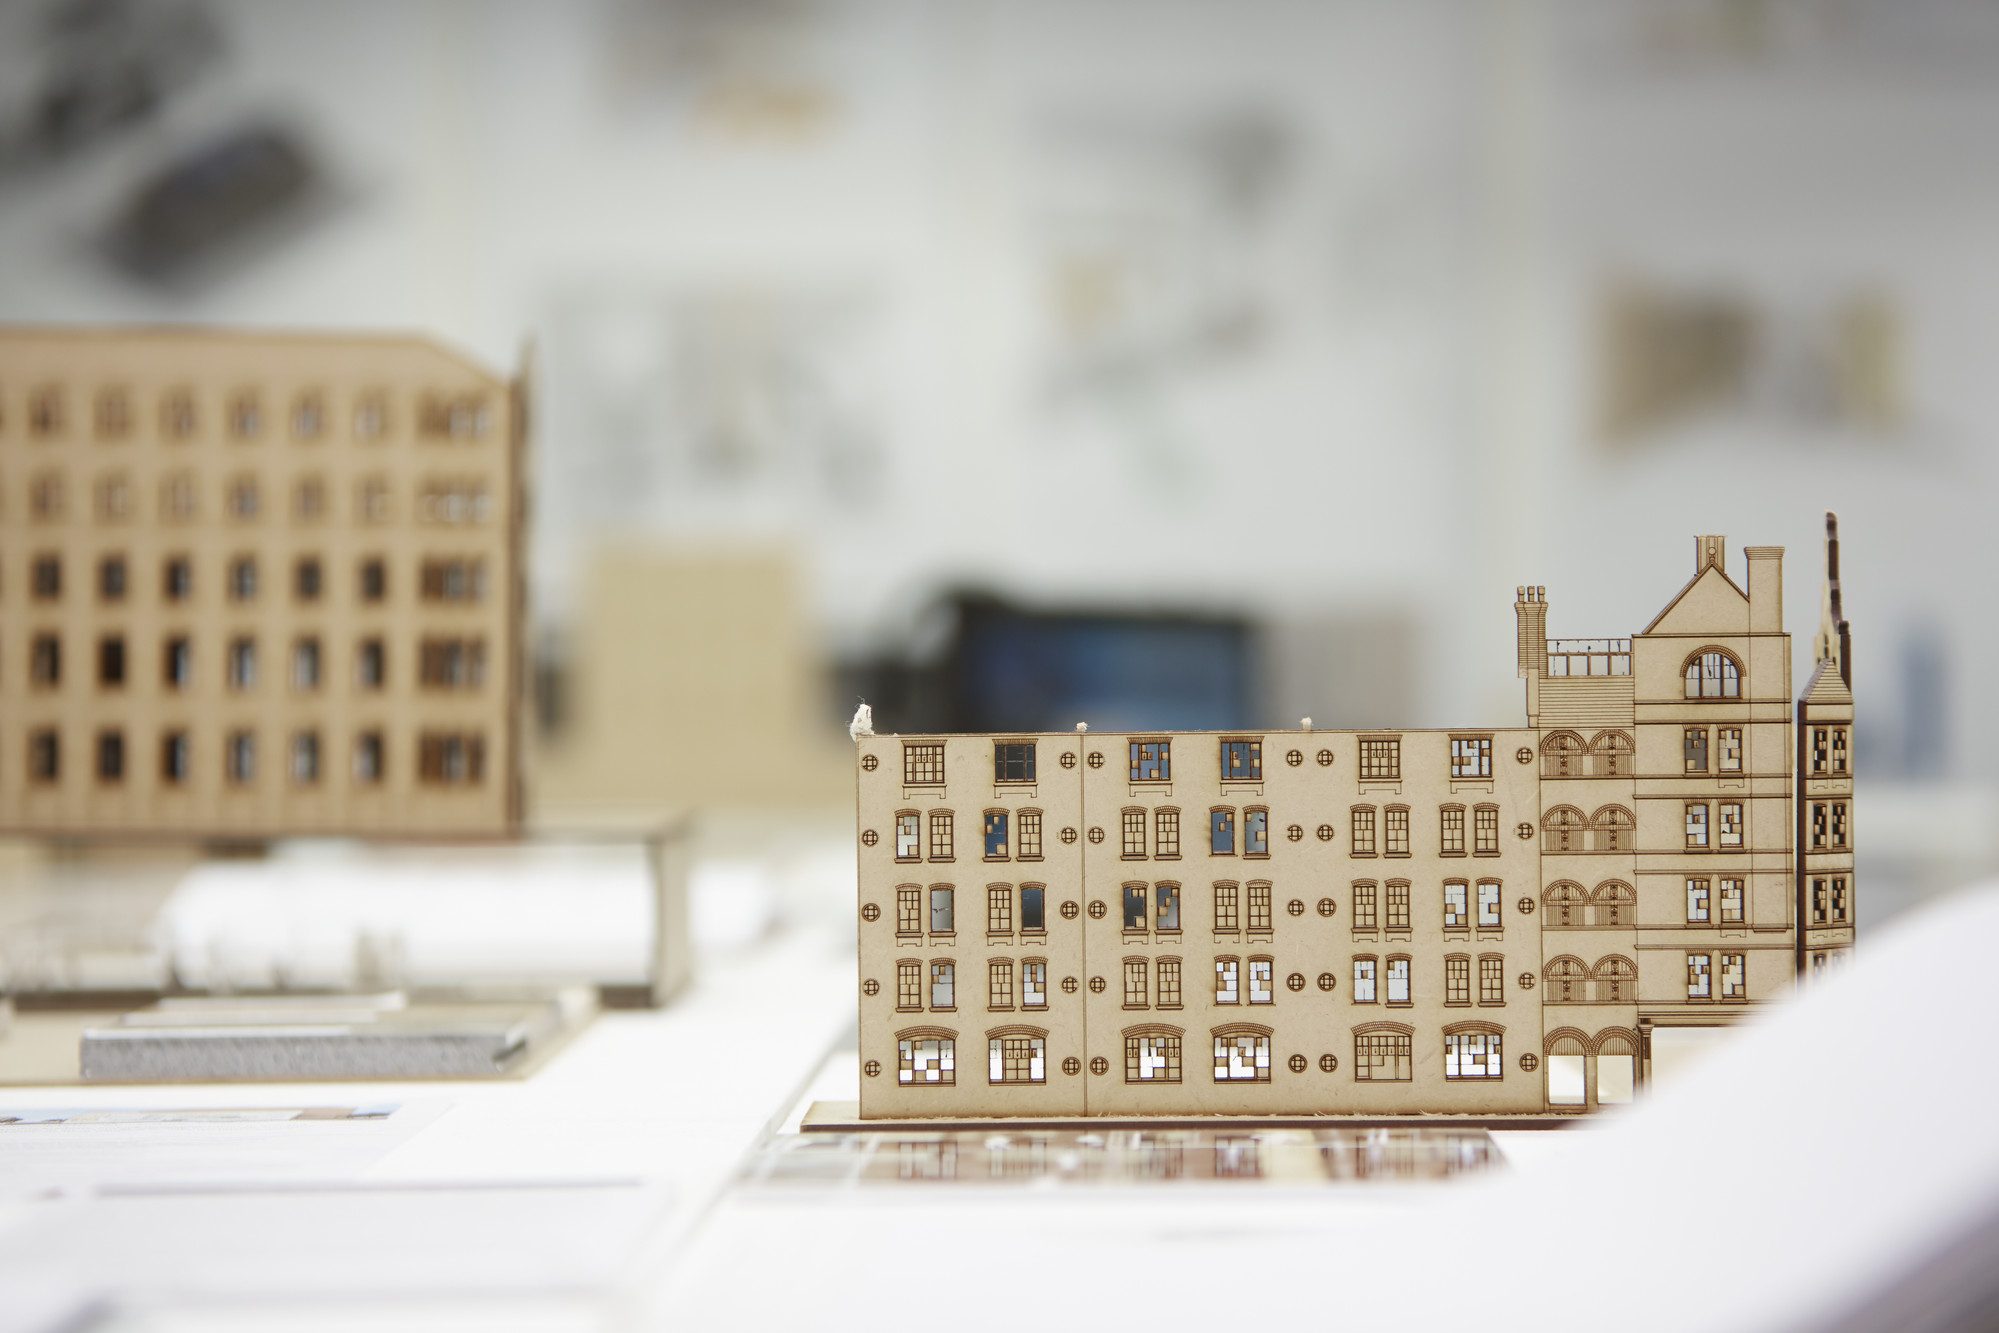 Manchester School of Architecture Studios